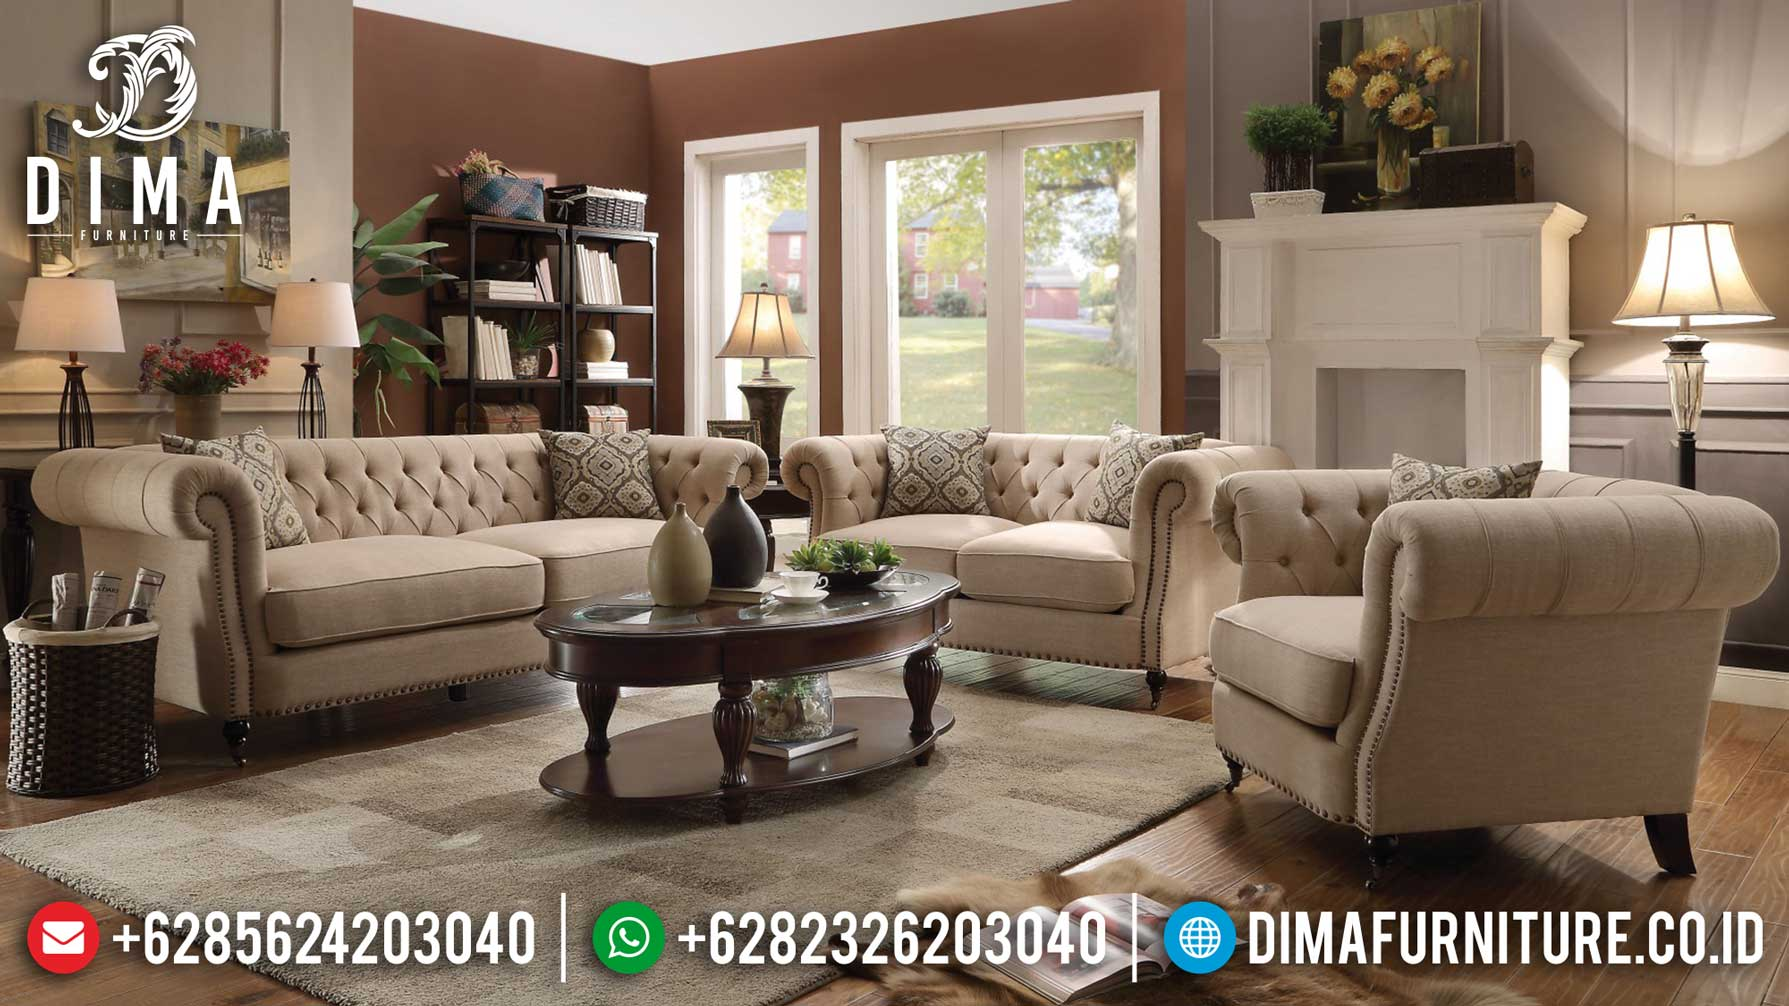 Buy Now Sofa Tamu Minimalis Retro Vintage Design Inspiring Living Room Mm-0770